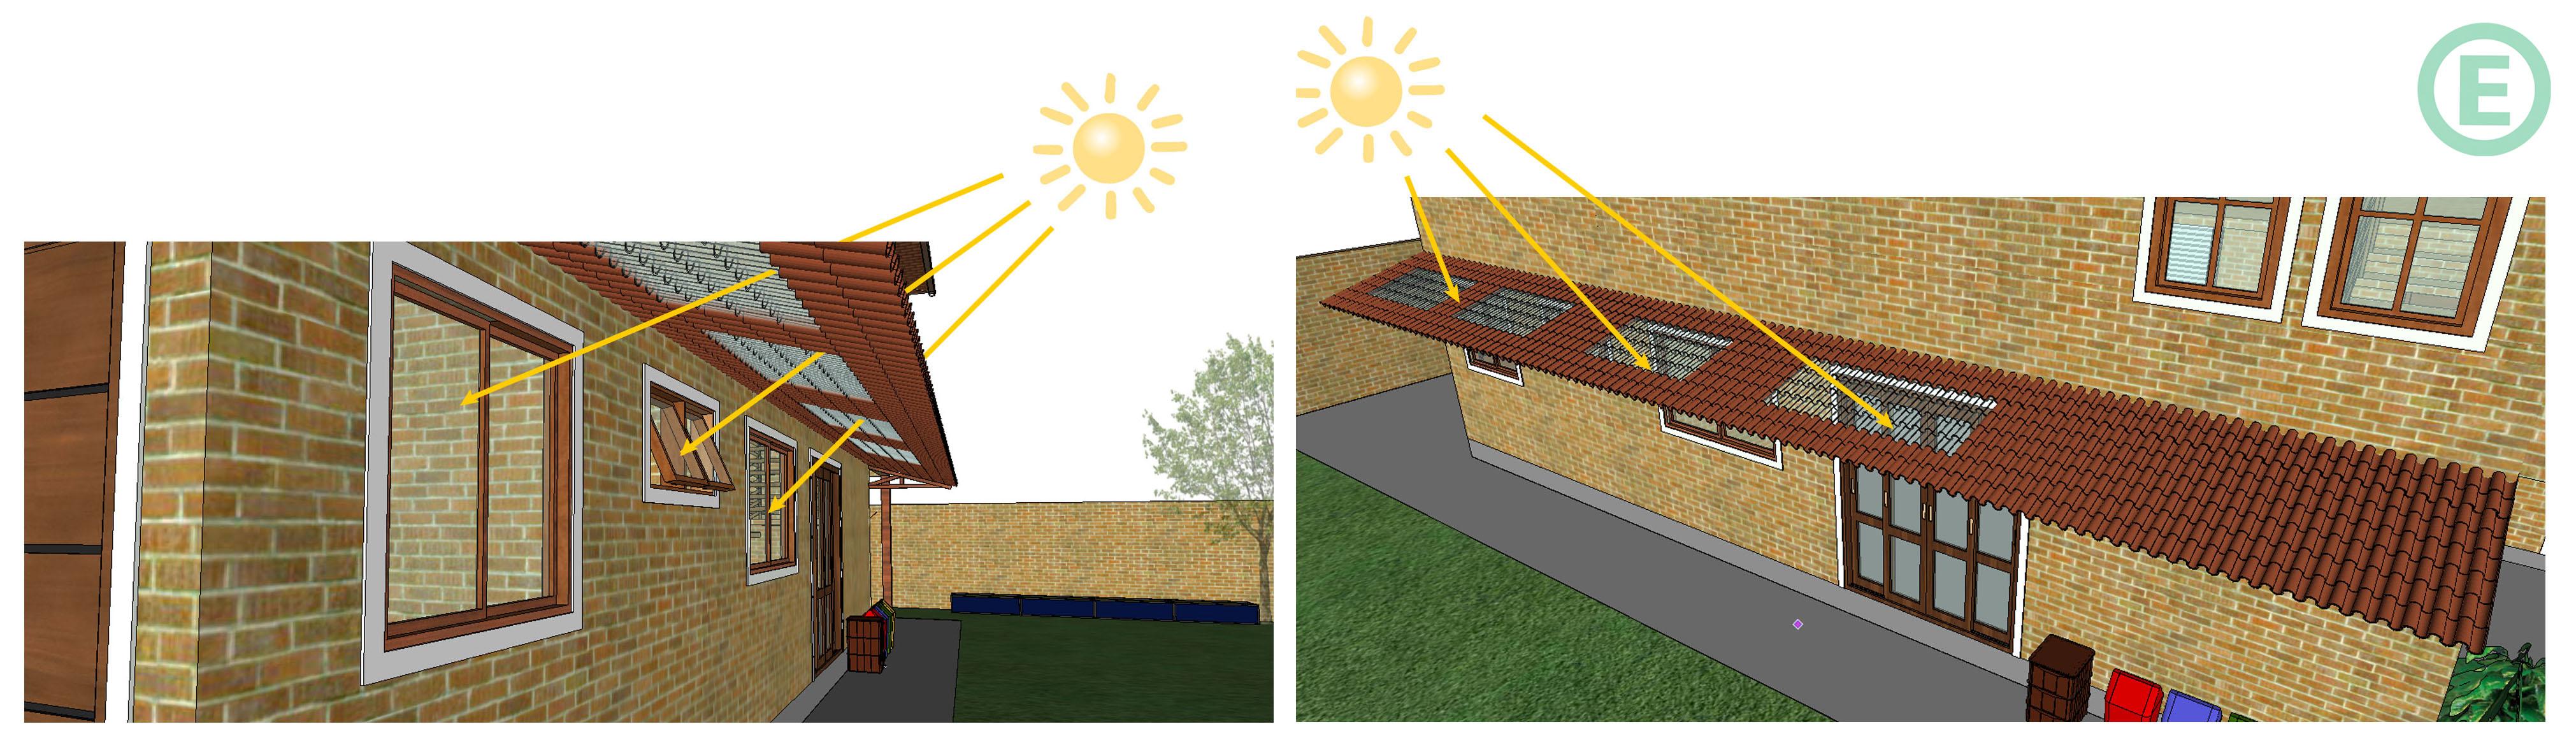 arquitetura-sustentavel-arquitetura-bioclimatica-telha-de-vidro-2